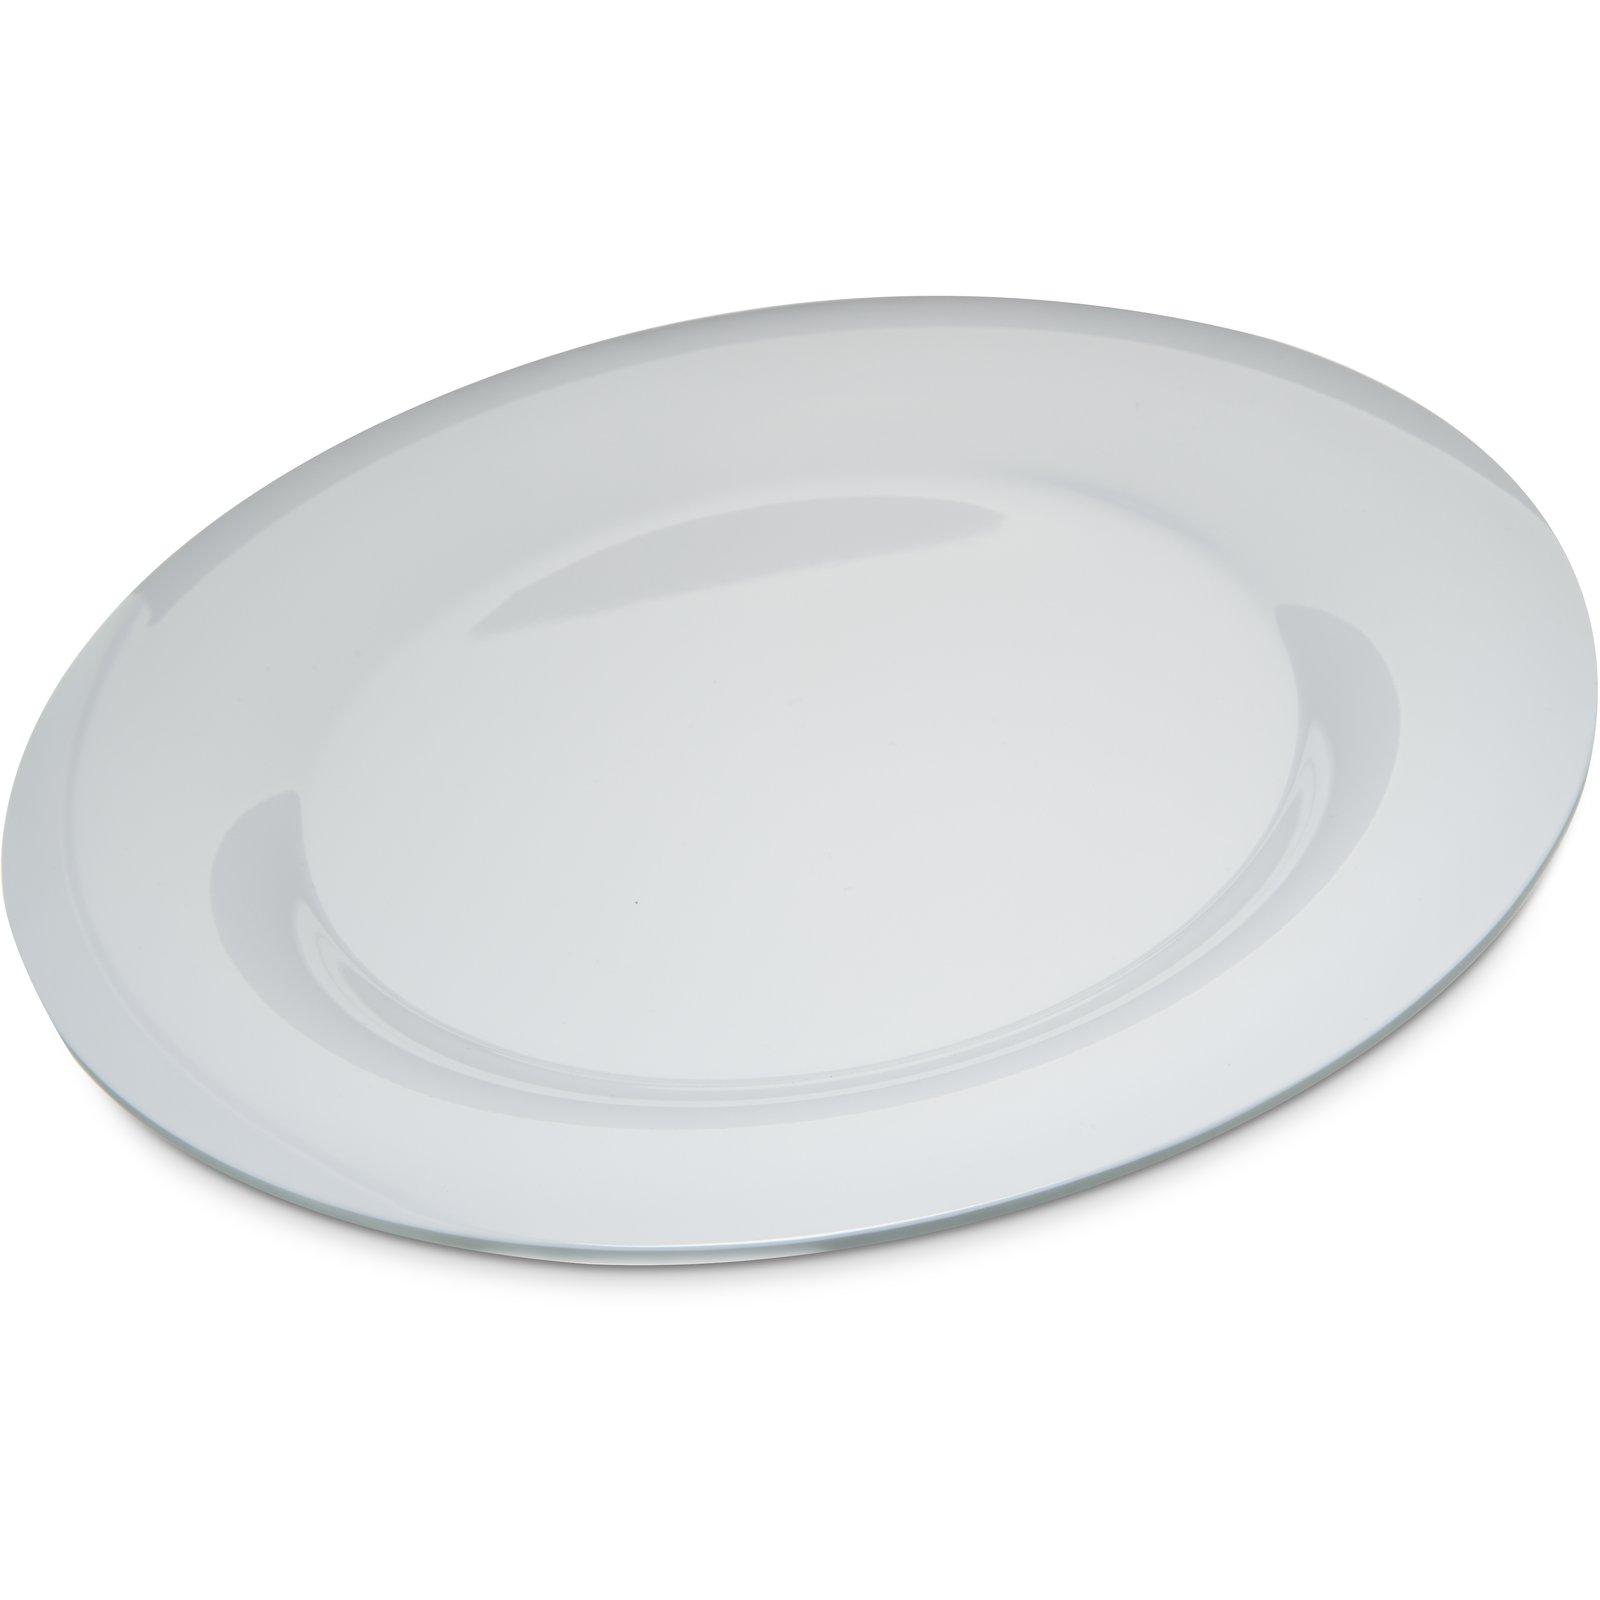 4302402 Designer Displayware Durus Melamine Wide Rim Round Plate 12 White Carlisle Foodservice Products